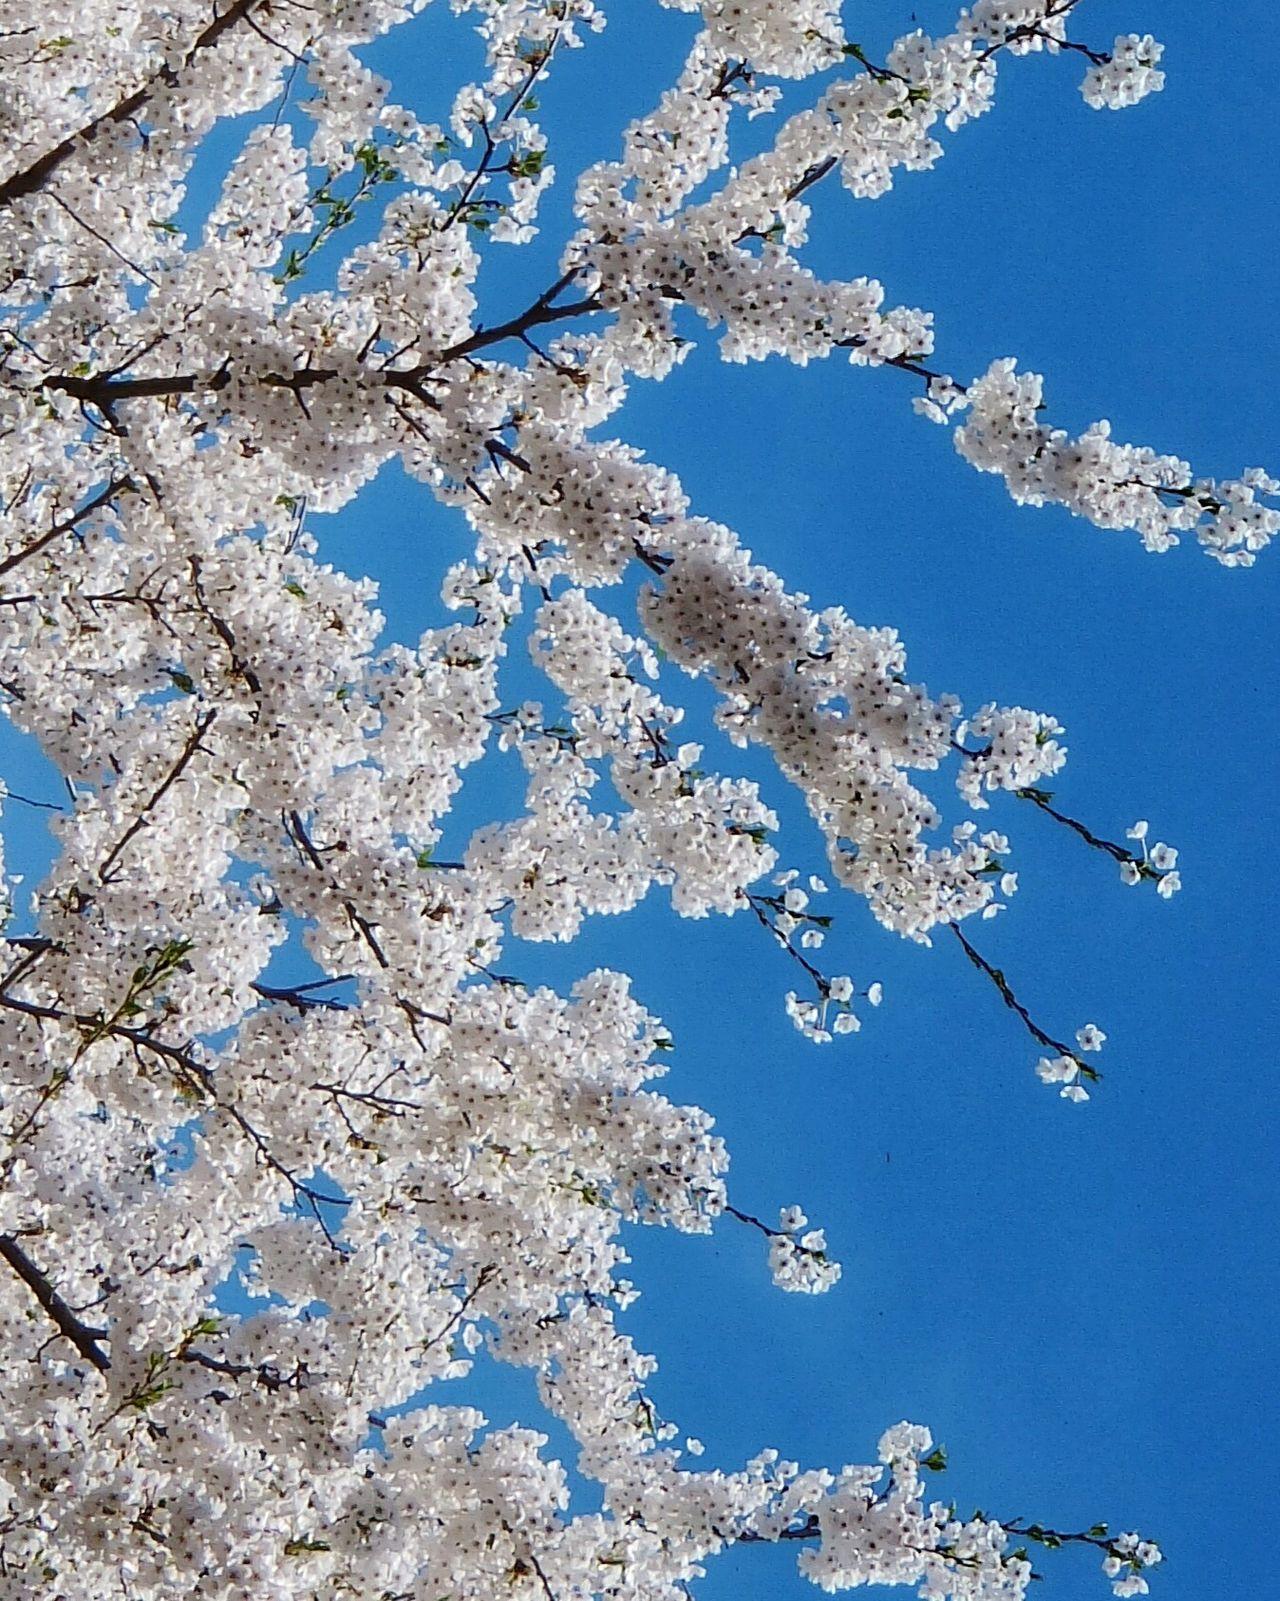 Sakura Cherry Blossoms Blossom Tree Beuty Treeflower Dreamy Pastel Pastel Power Spring 1stlove Pure WeatherPro: Your Perfect Weather Shot Spring Tree Springtime Saku